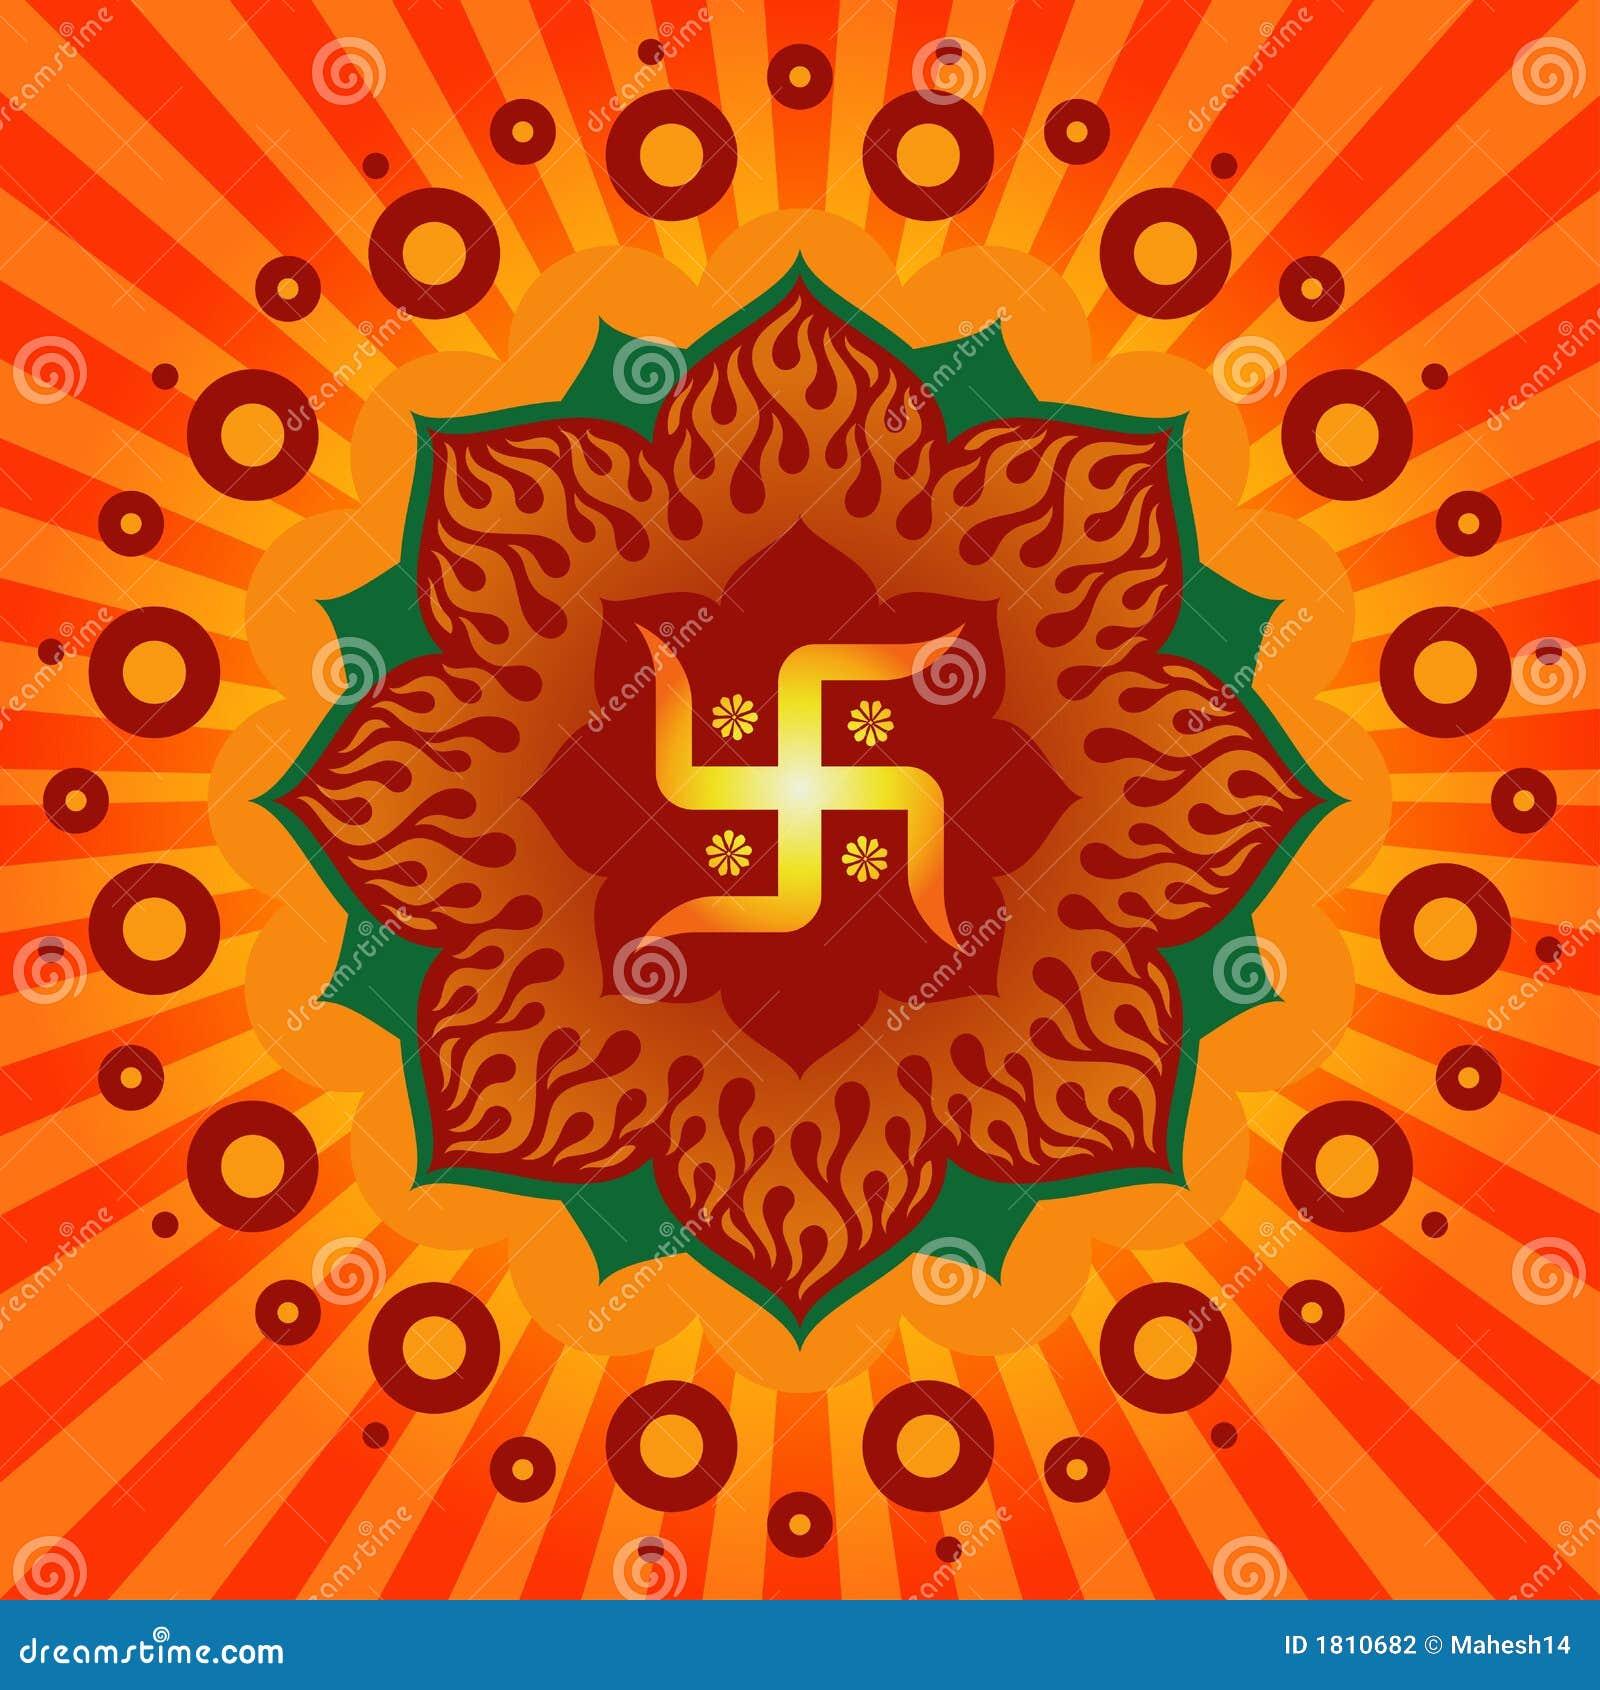 Hd wallpaper ganesh - Swastik Stock Photography Image 1810682